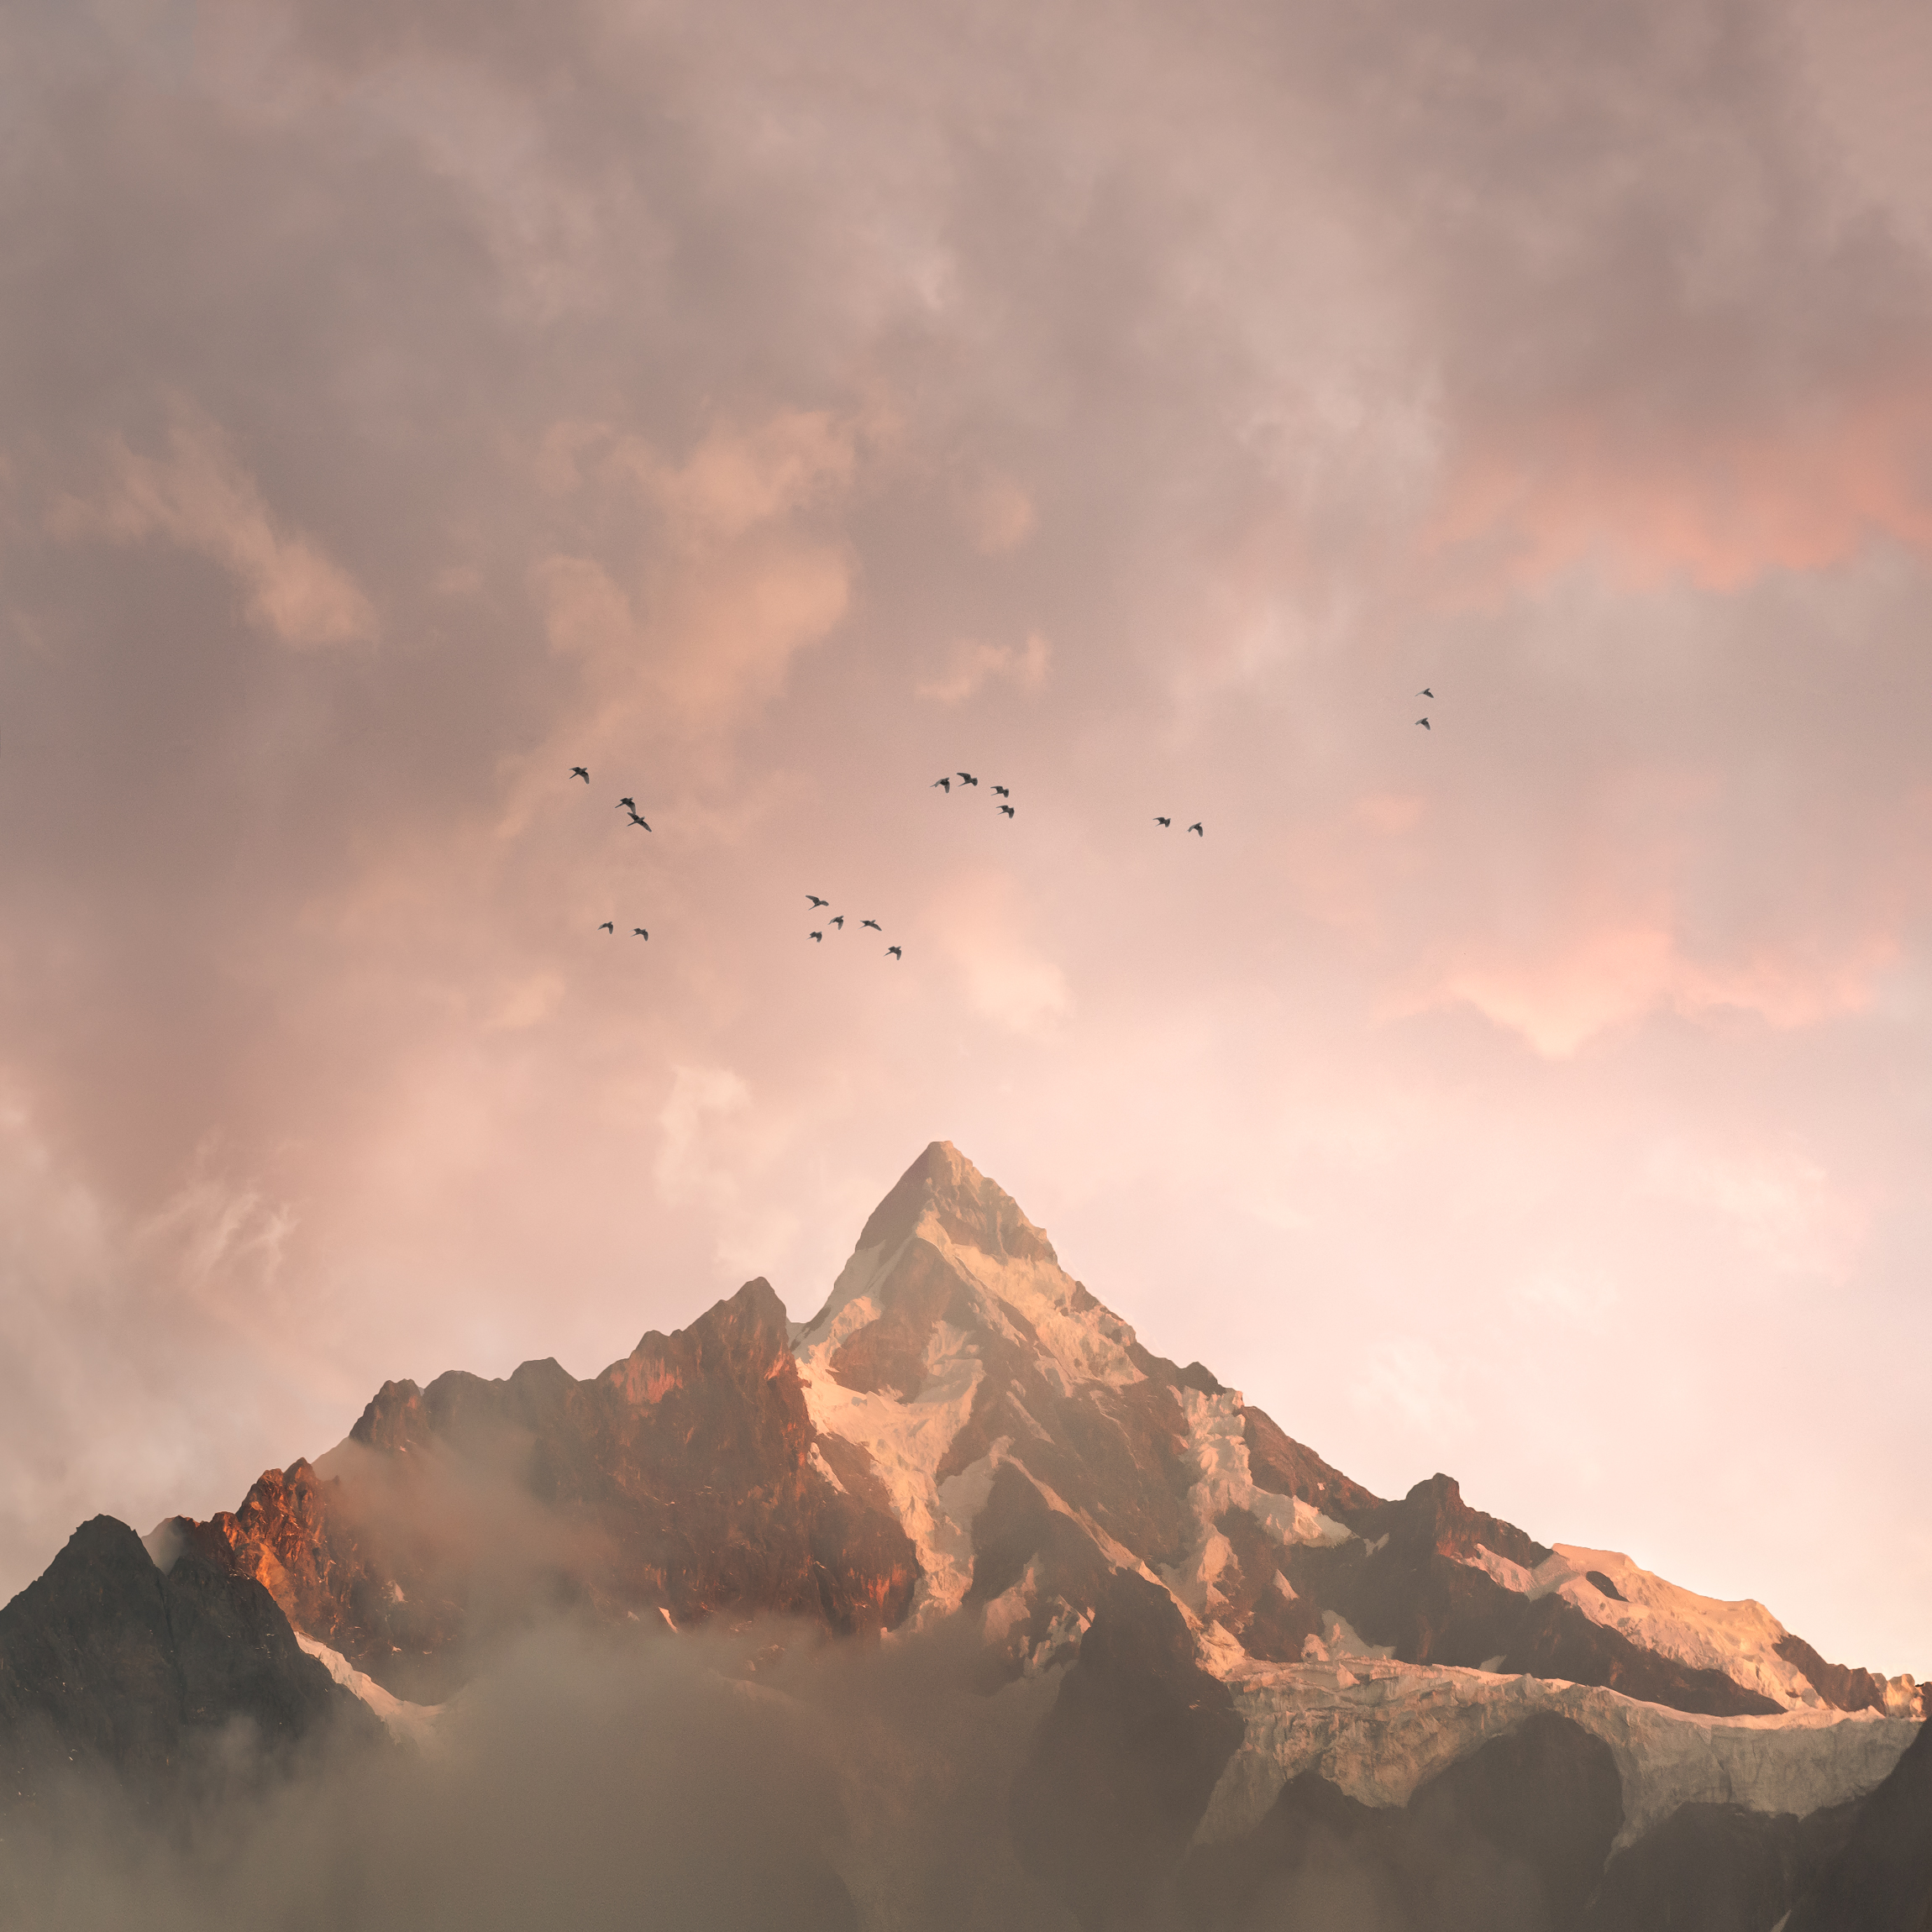 2nd Place Sunrise/Sunset Category - Sunrise over Nevado Humantay (Salkantay Trail, Peru)